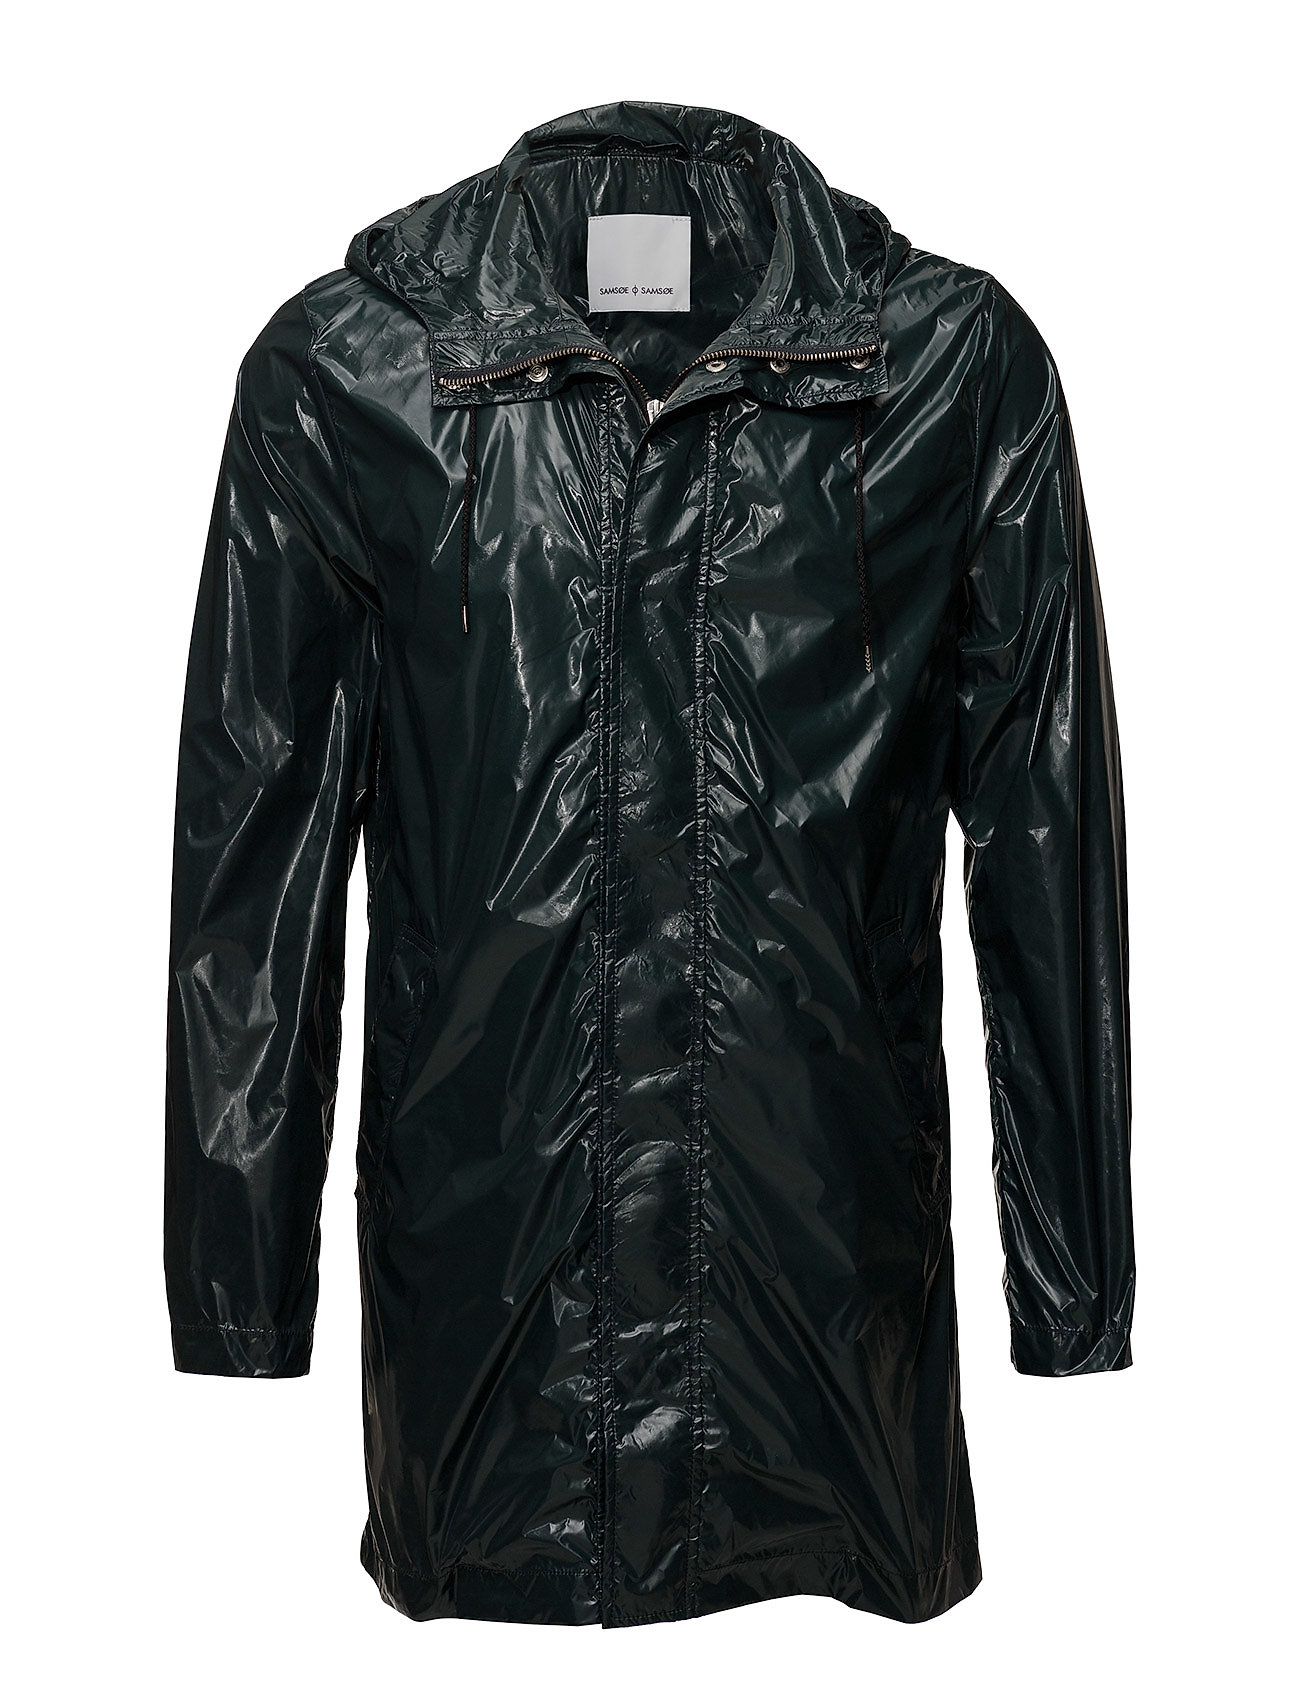 Samsøe & Samsøe Tame jacket 10008 - BAYBERRY